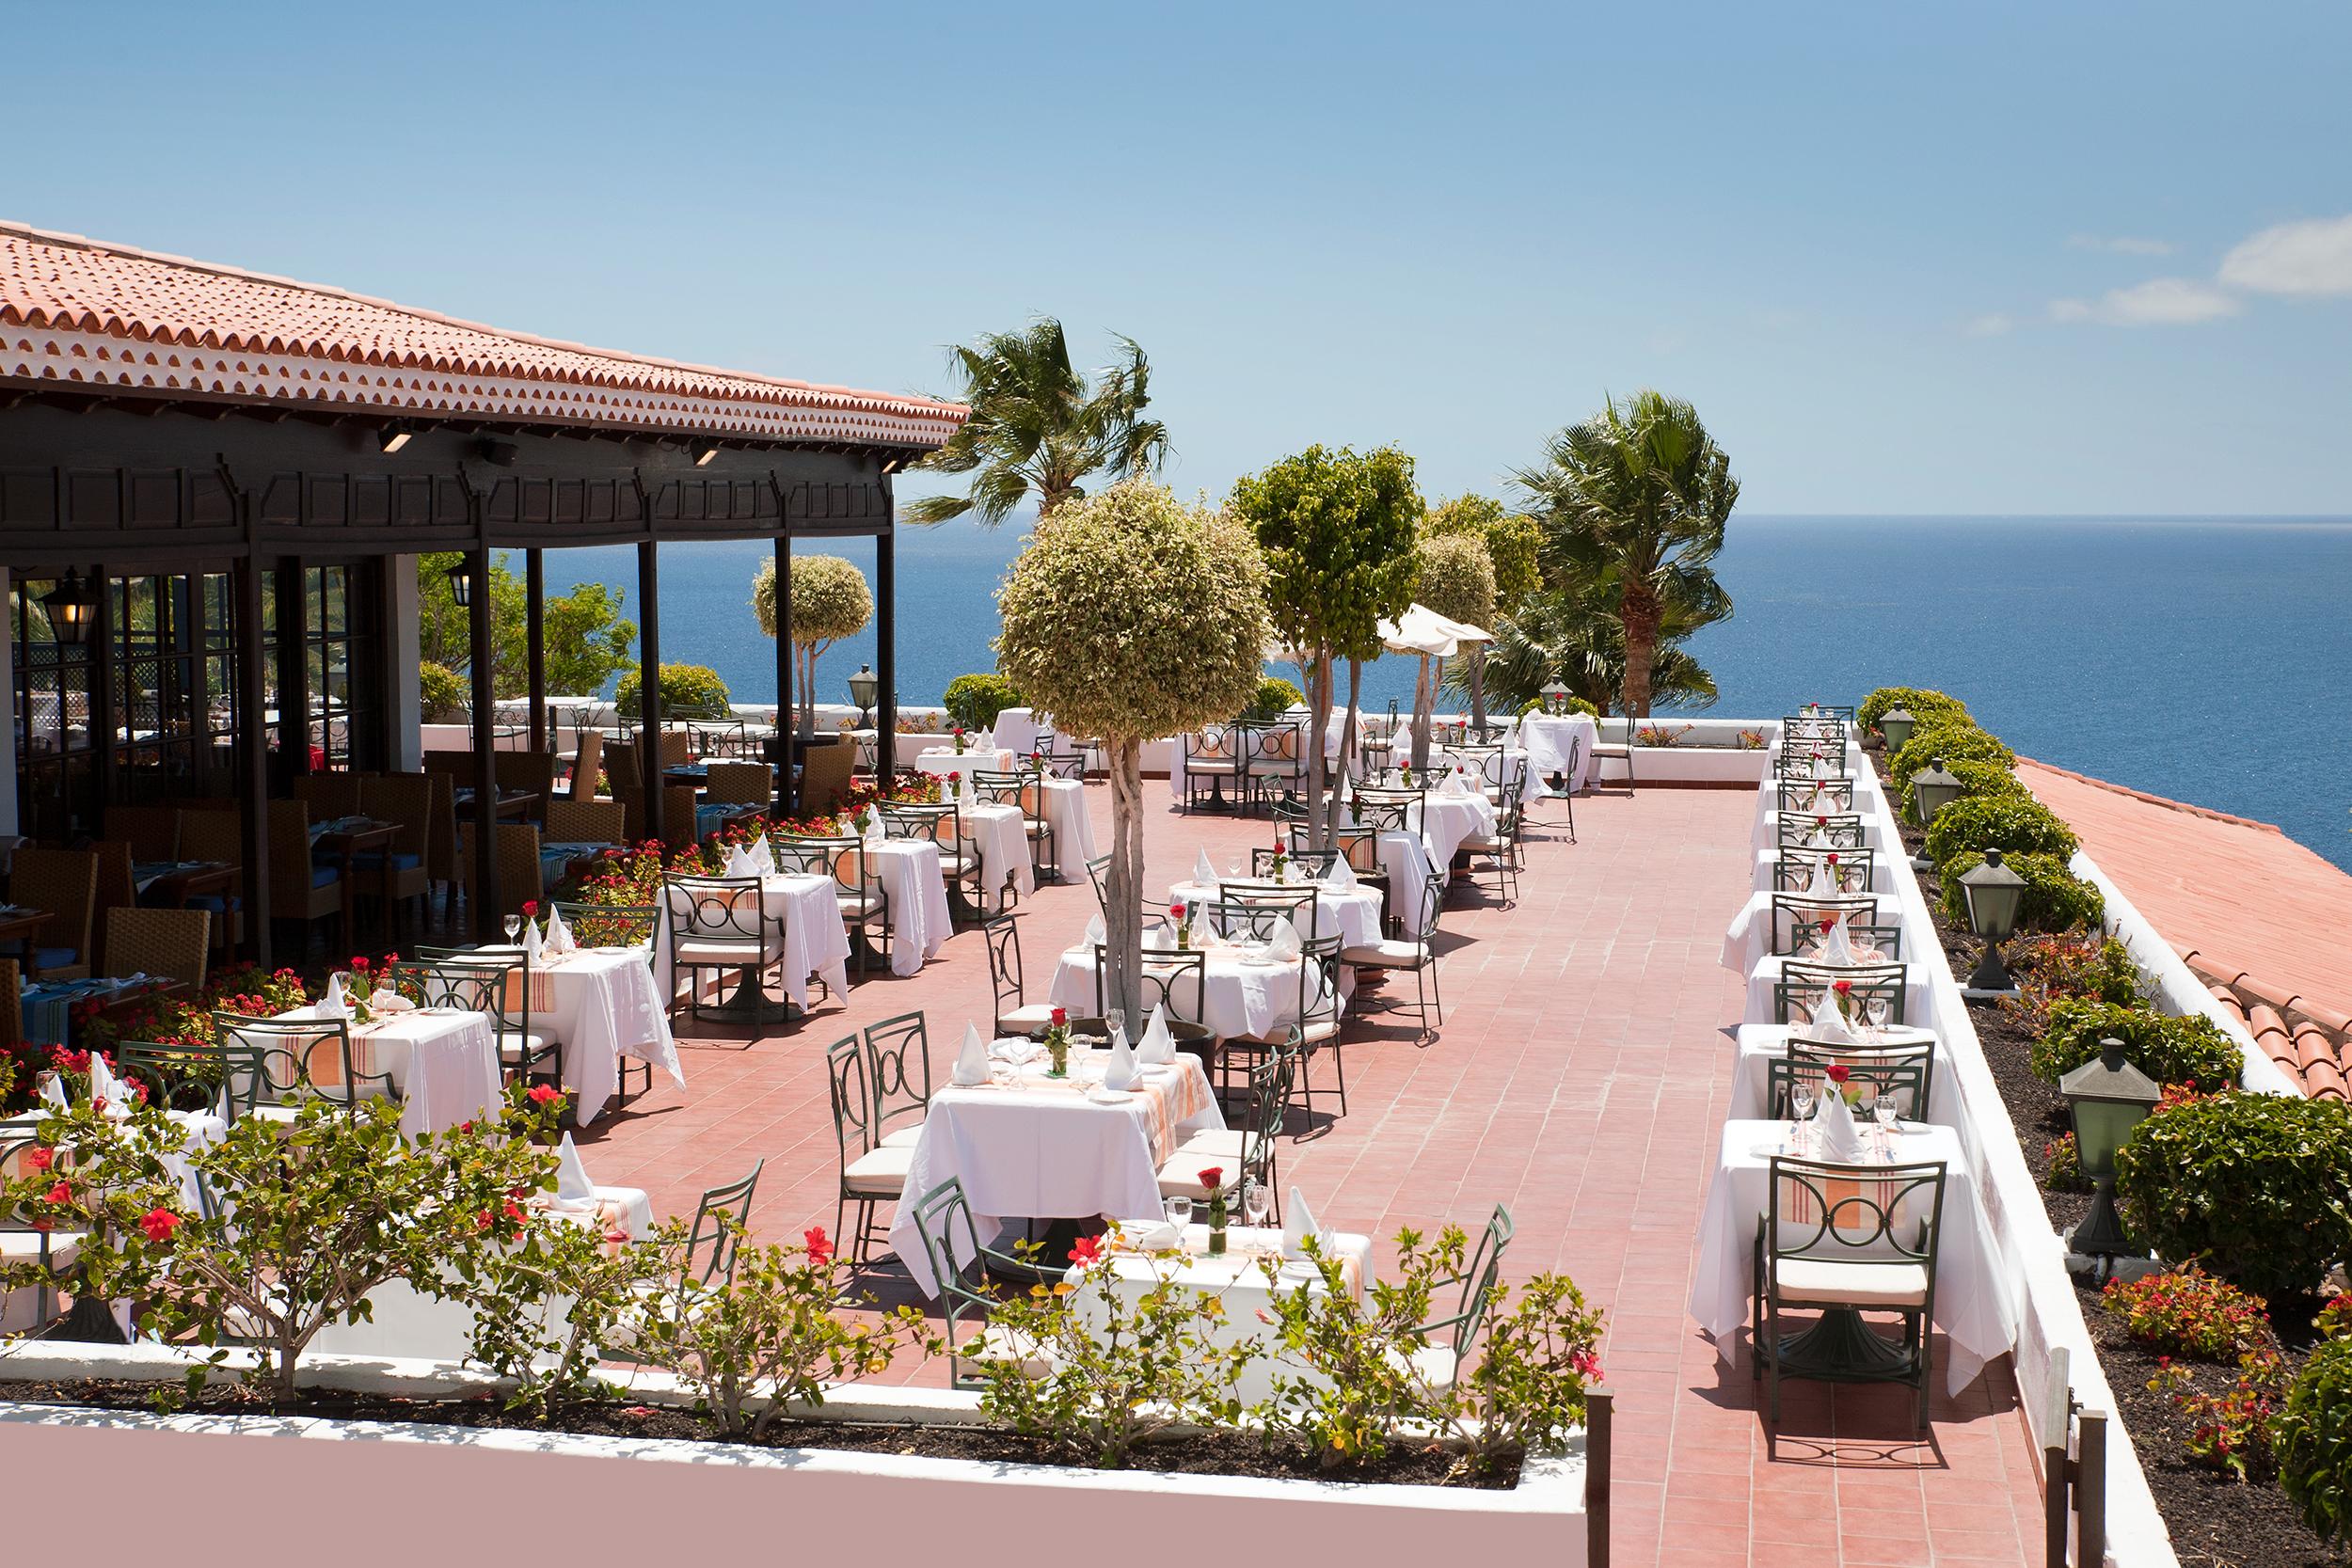 Gara Restaurant